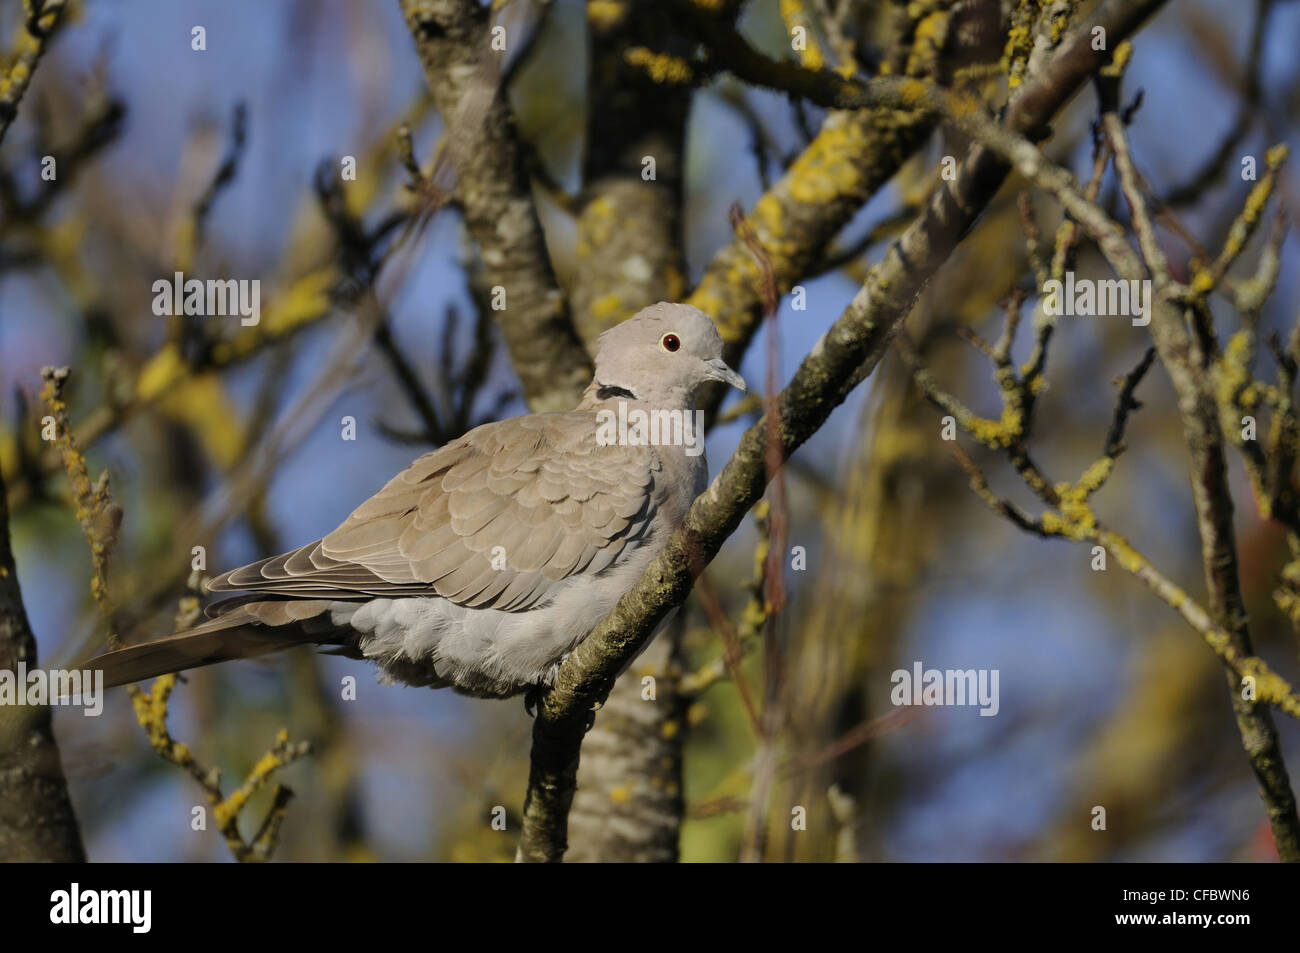 Eurasian Collared Dove, Streptopelia decaocto, Columbidae, dove, animal, bird, Champagne, France Stock Photo